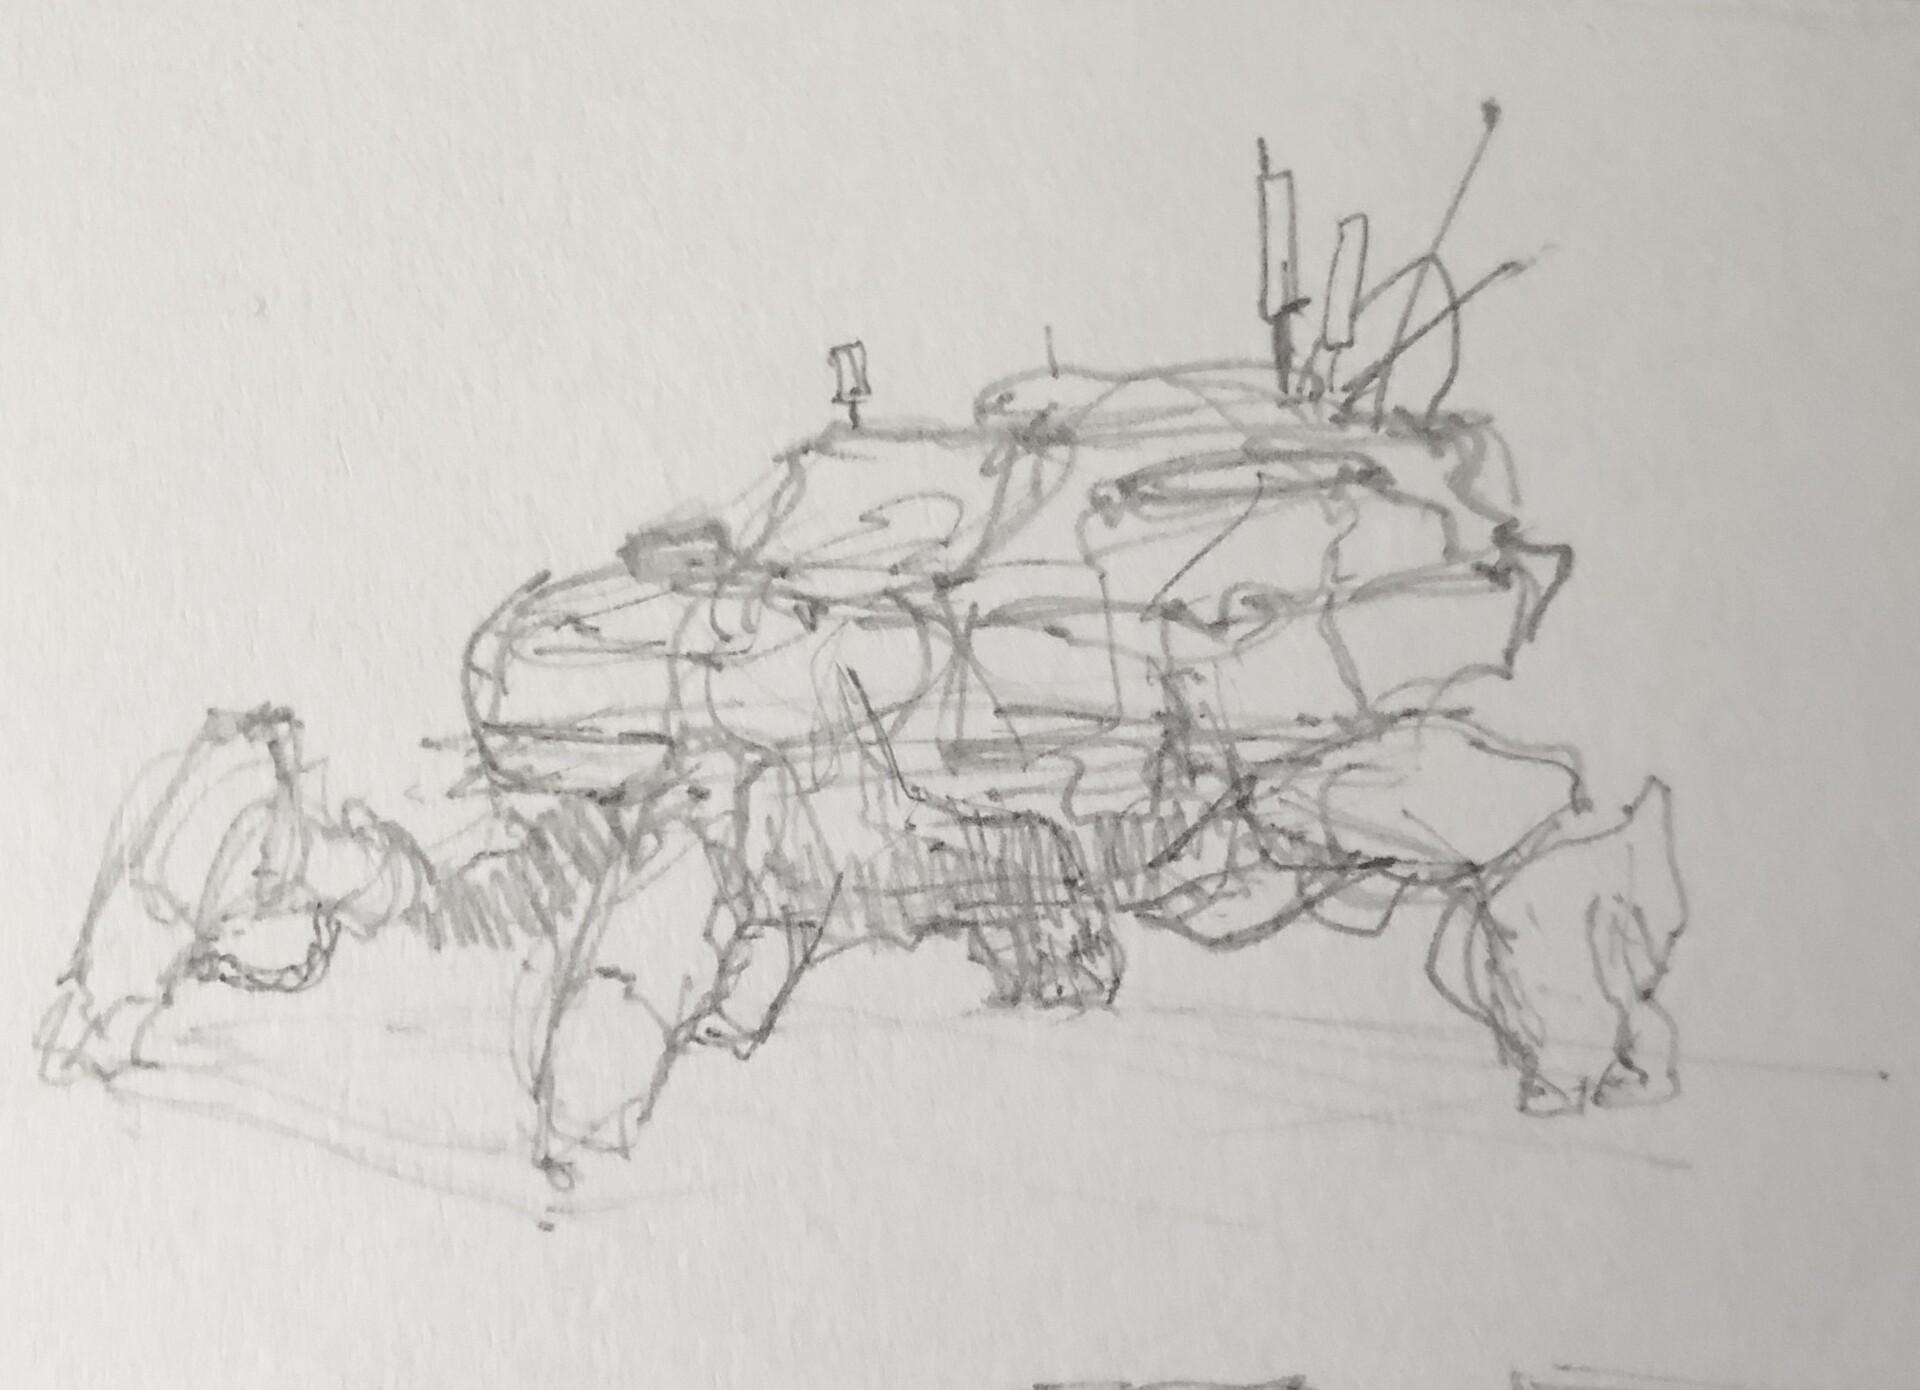 Initial thumbnail sketch